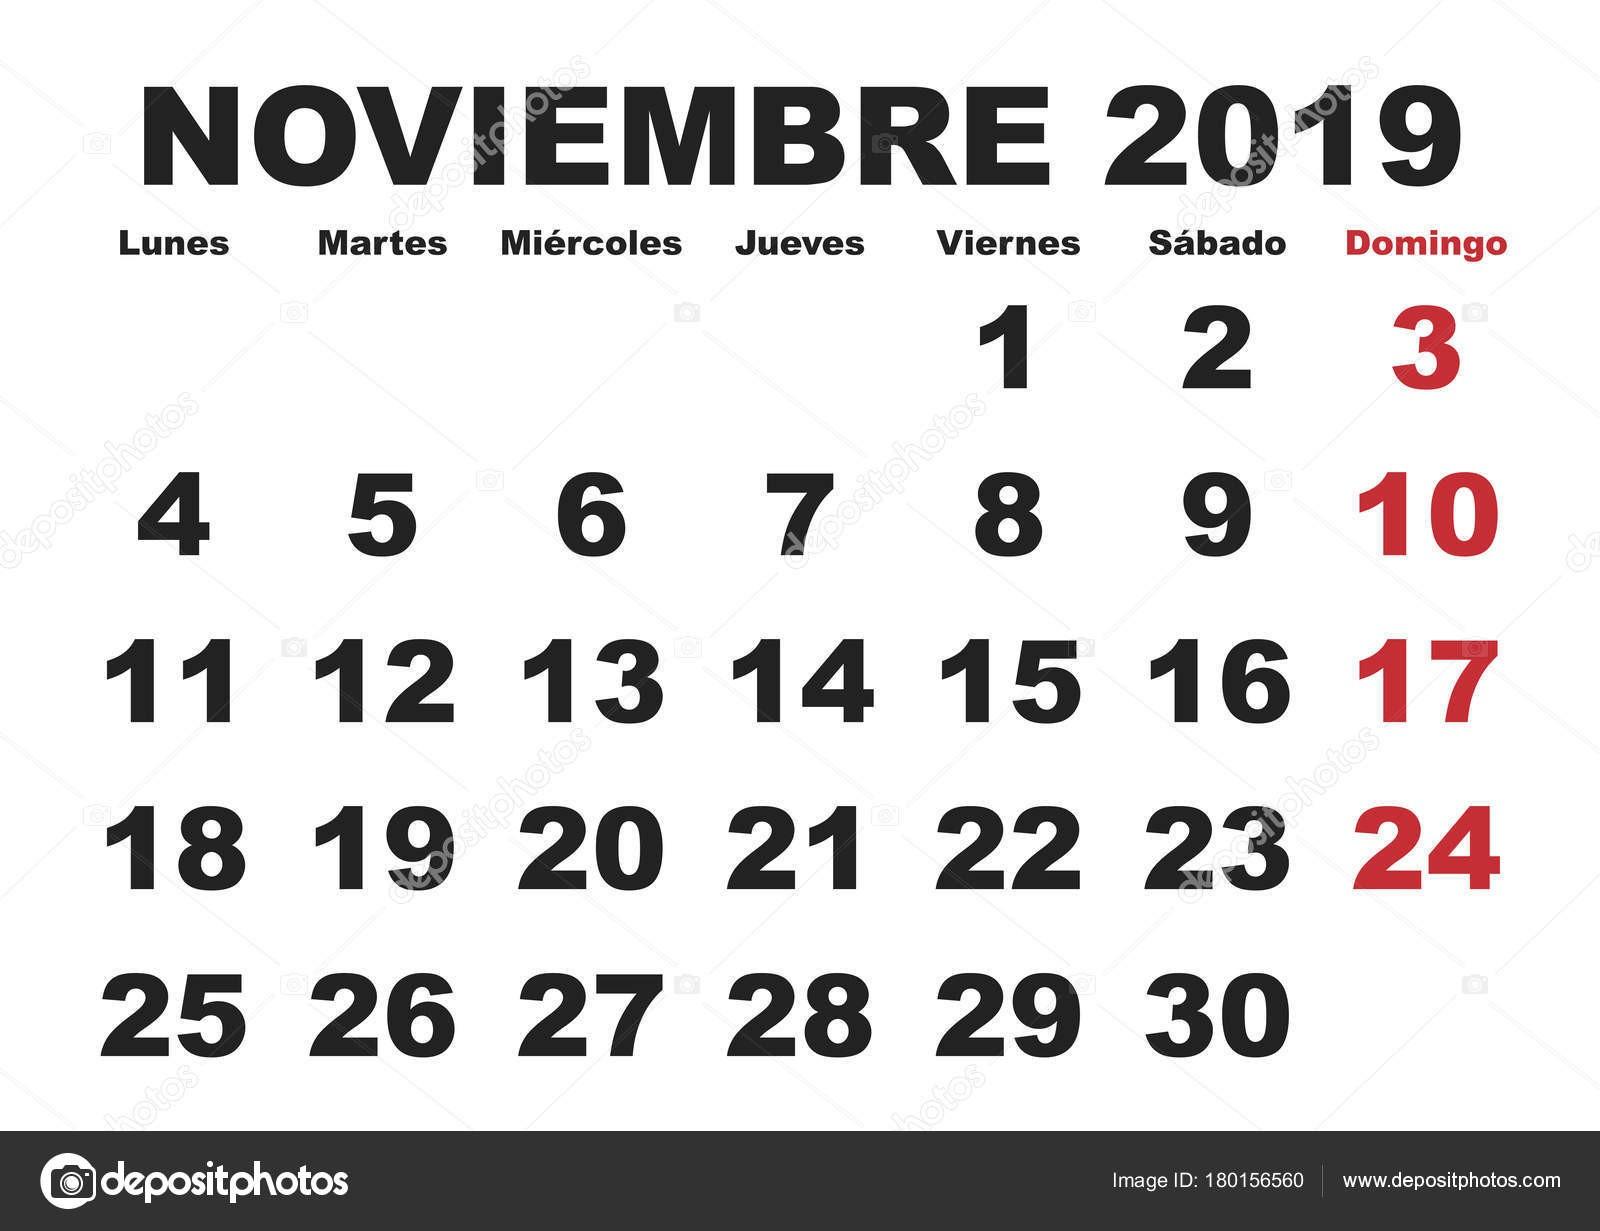 depositphotos stock illustration noviembre 2019 wall calendar spanish